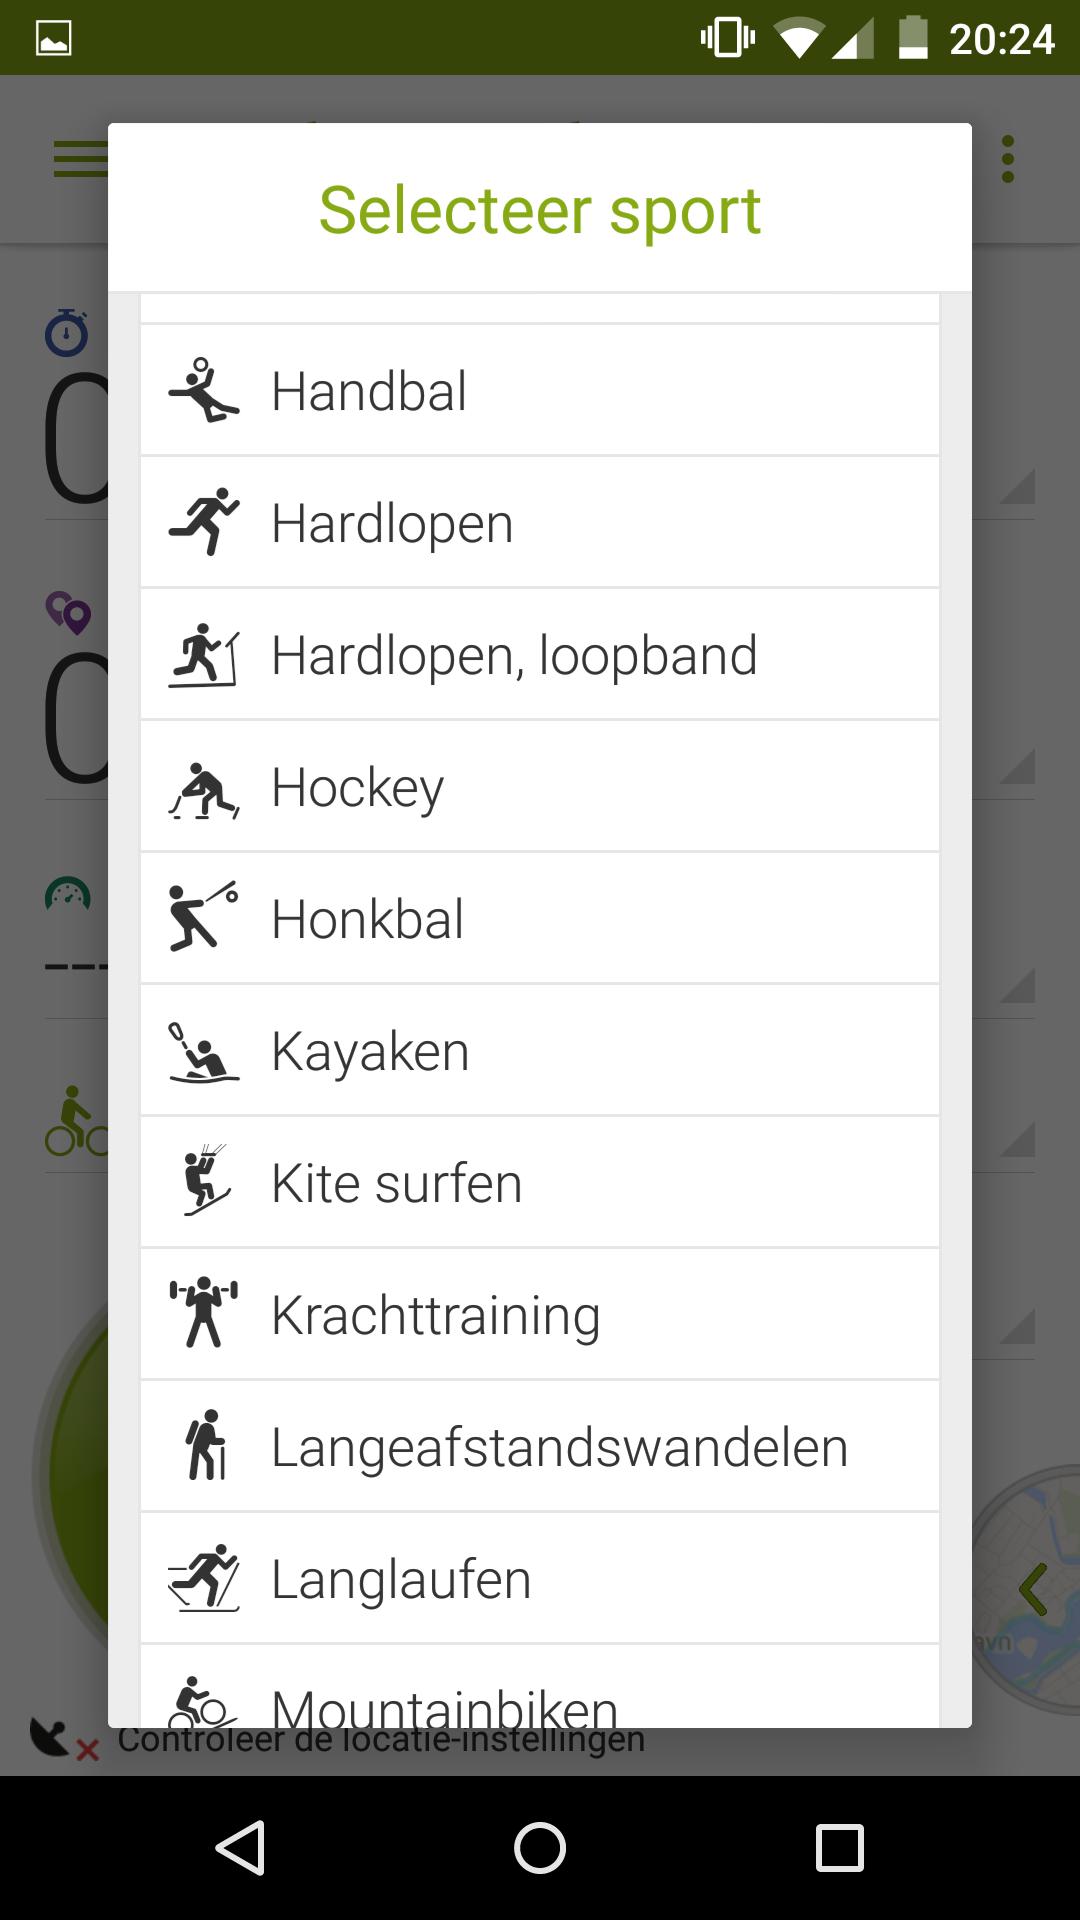 Endomondo - list of sports